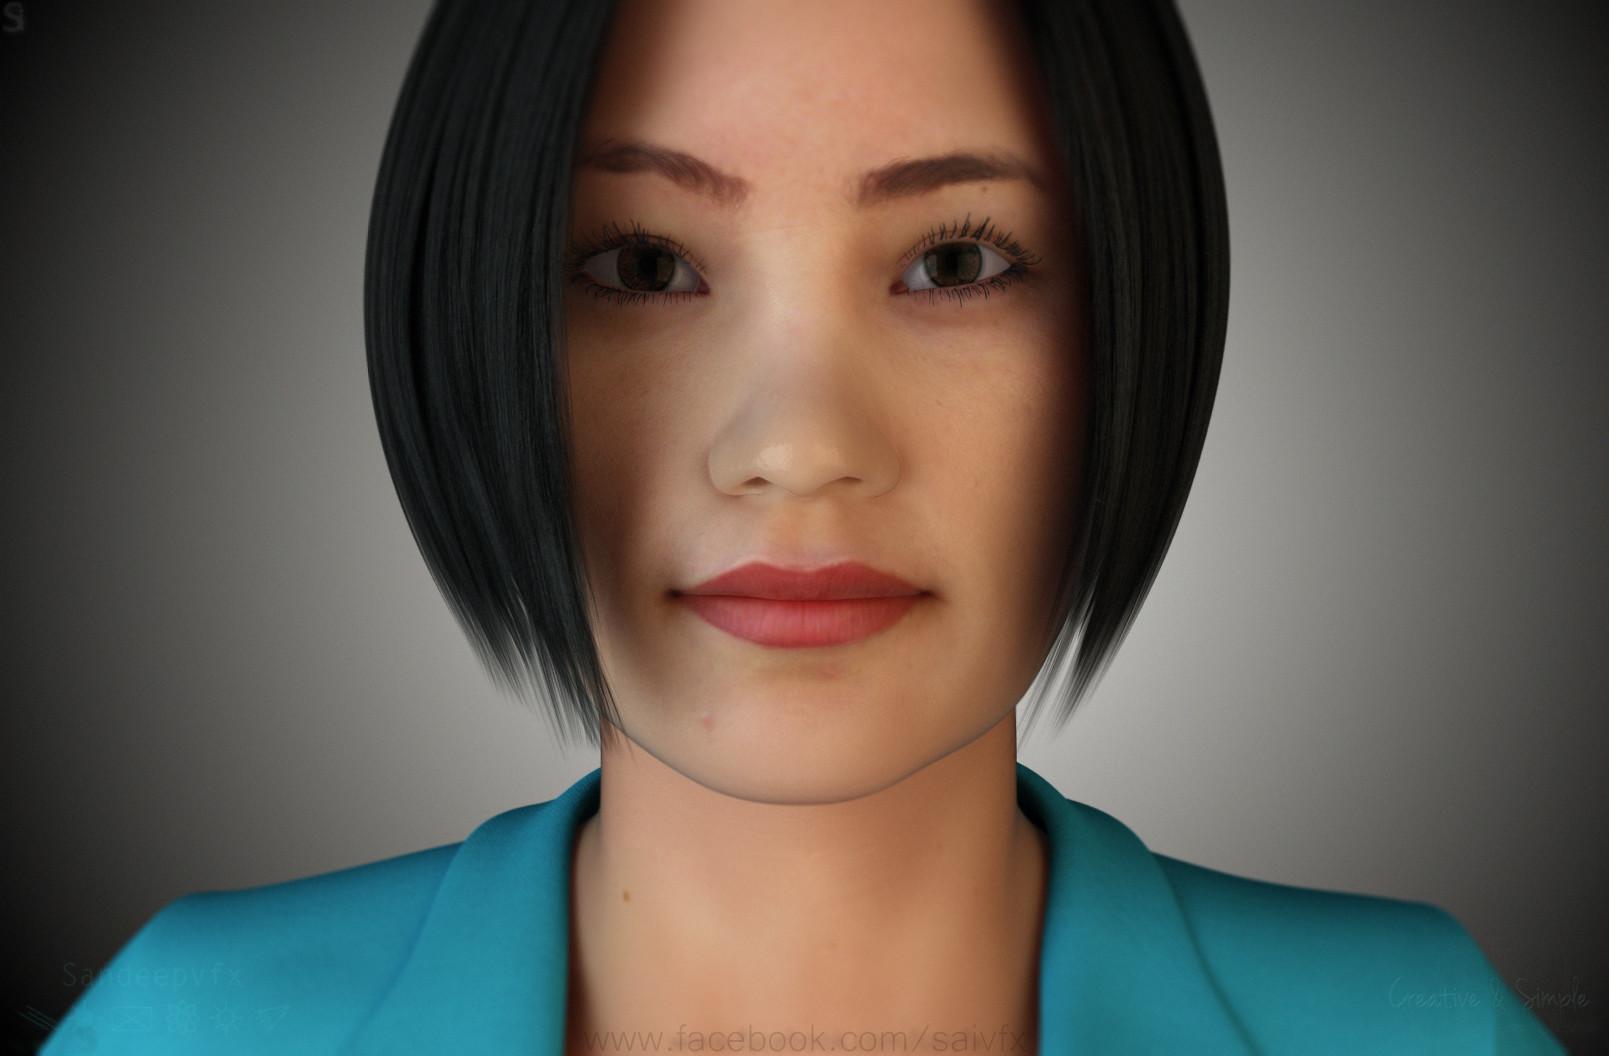 ArtStation - CGI WORKS, Venkata sai sandeep siddam